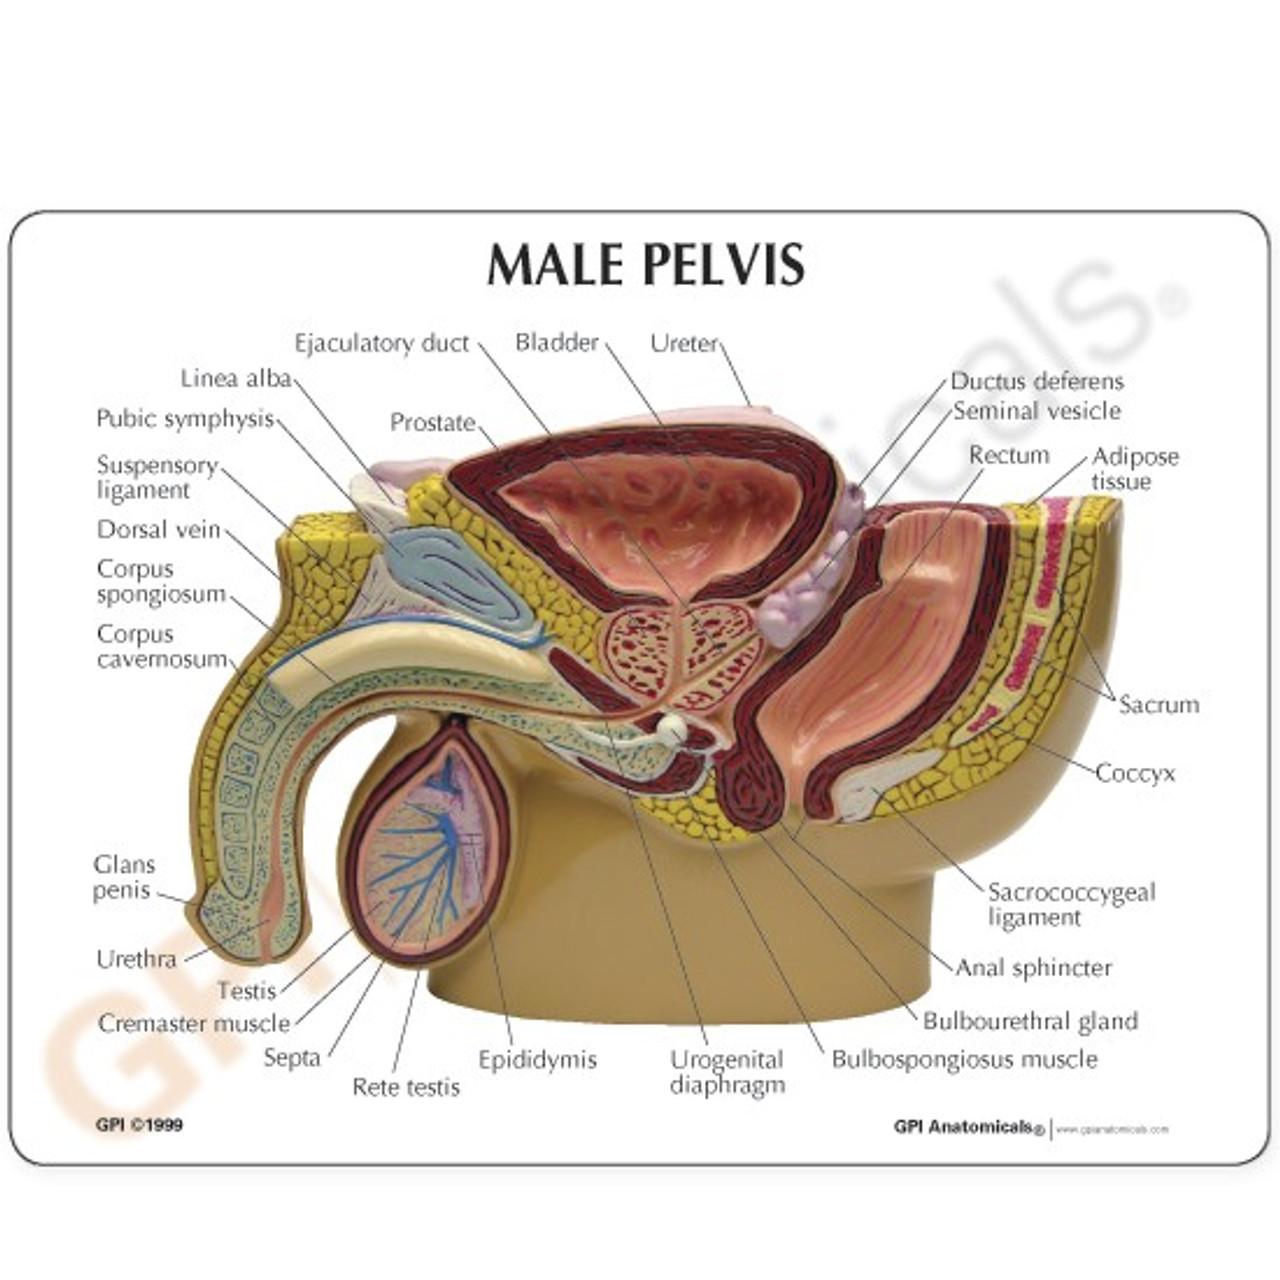 Male Pelvis and Prostate Anatomical Model Description Card